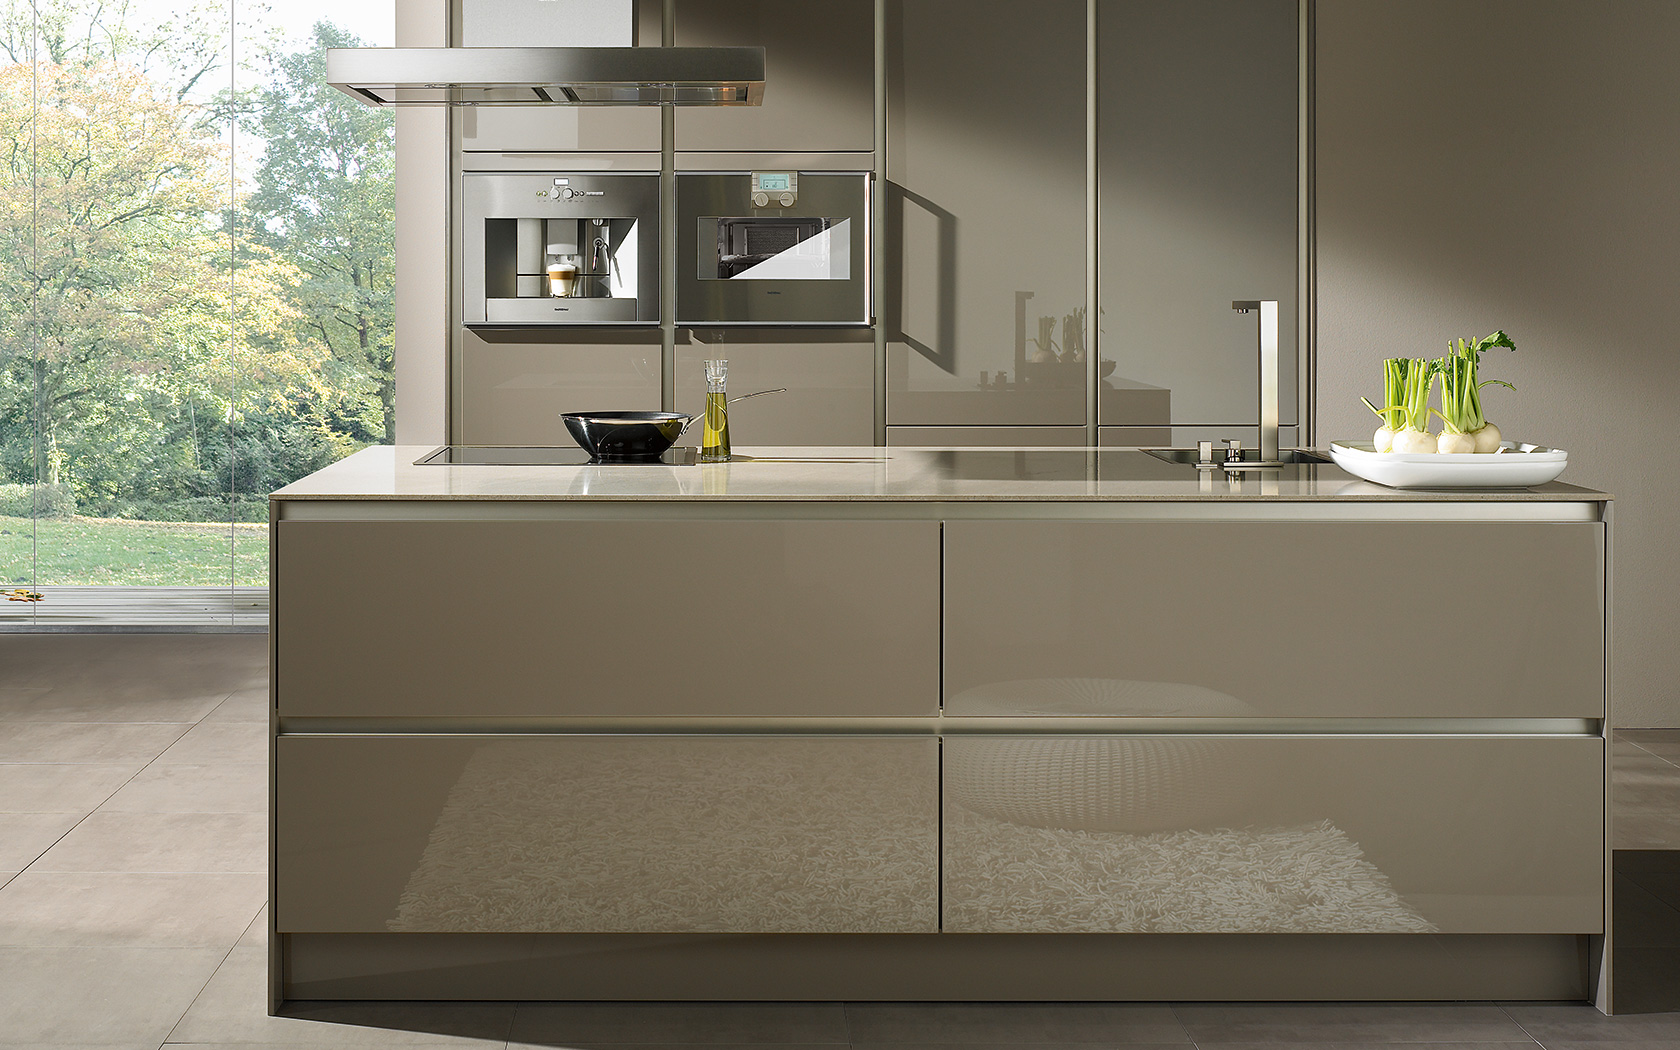 Keuken ideeen kleur indrukwekkend badkamer keuken kleur idee